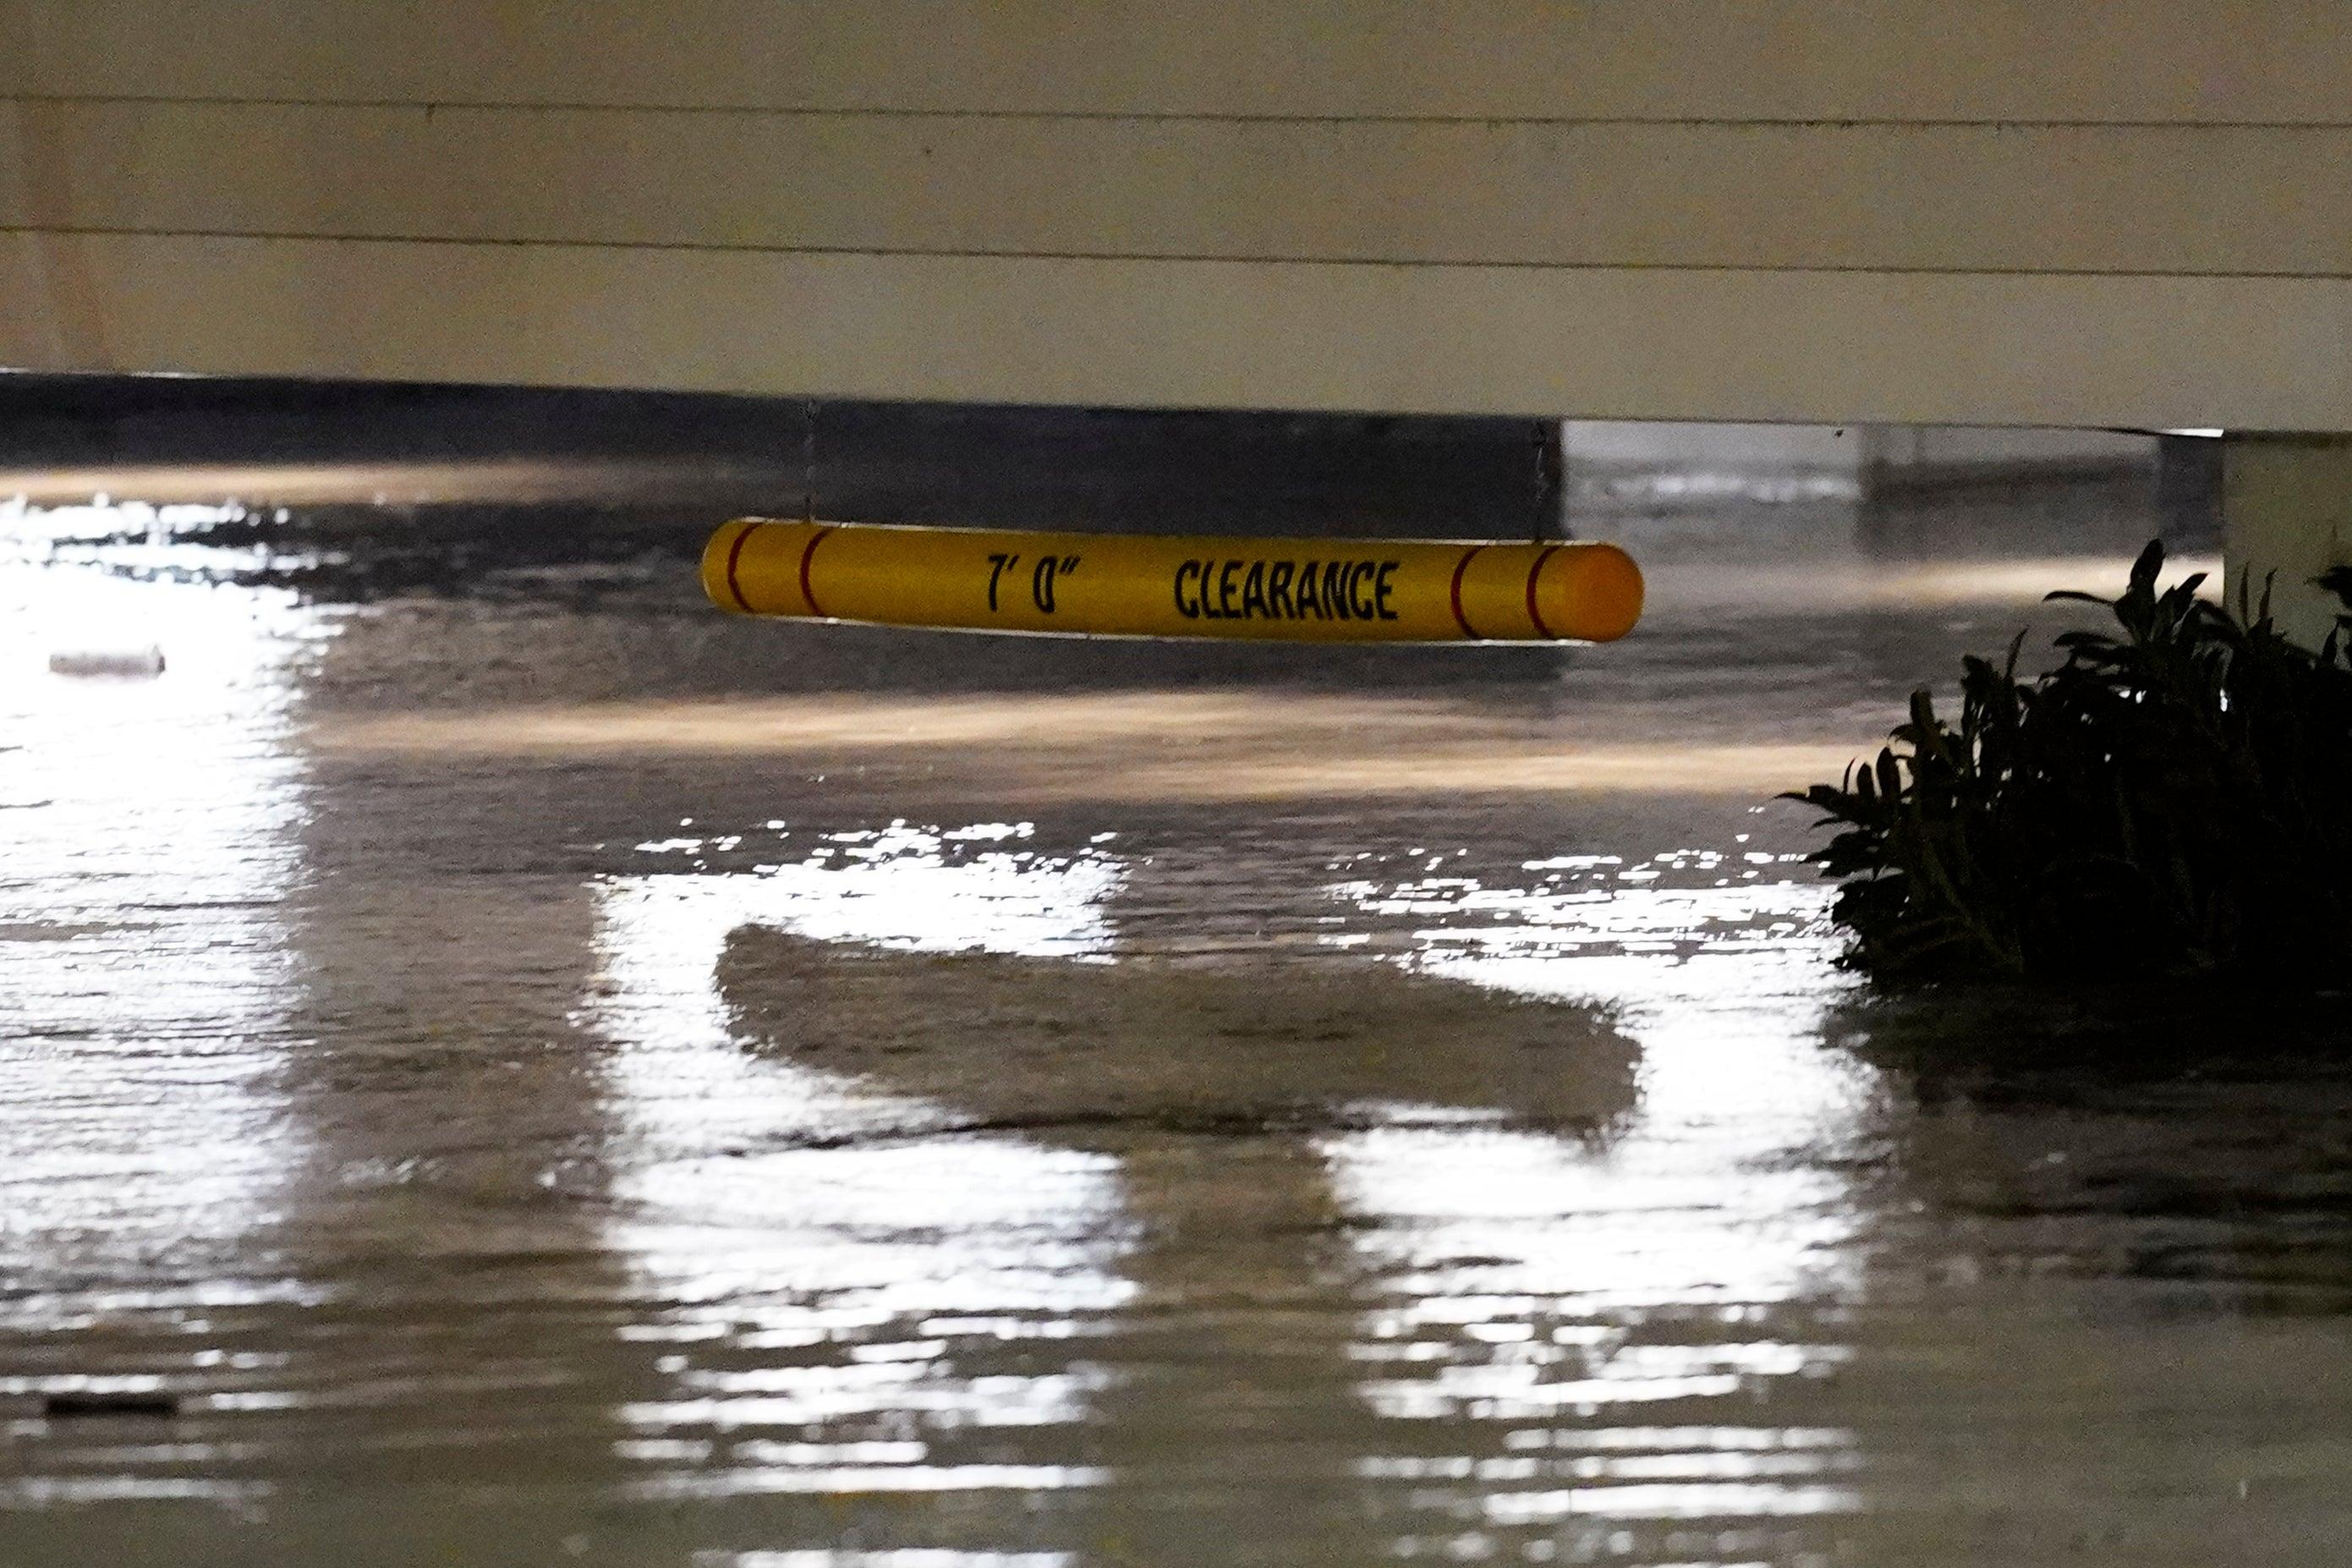 Remnants of Ida Bring Devastating Flooding, Severe Weather to Mid-Atlantic, Northeast (PHOTOS)